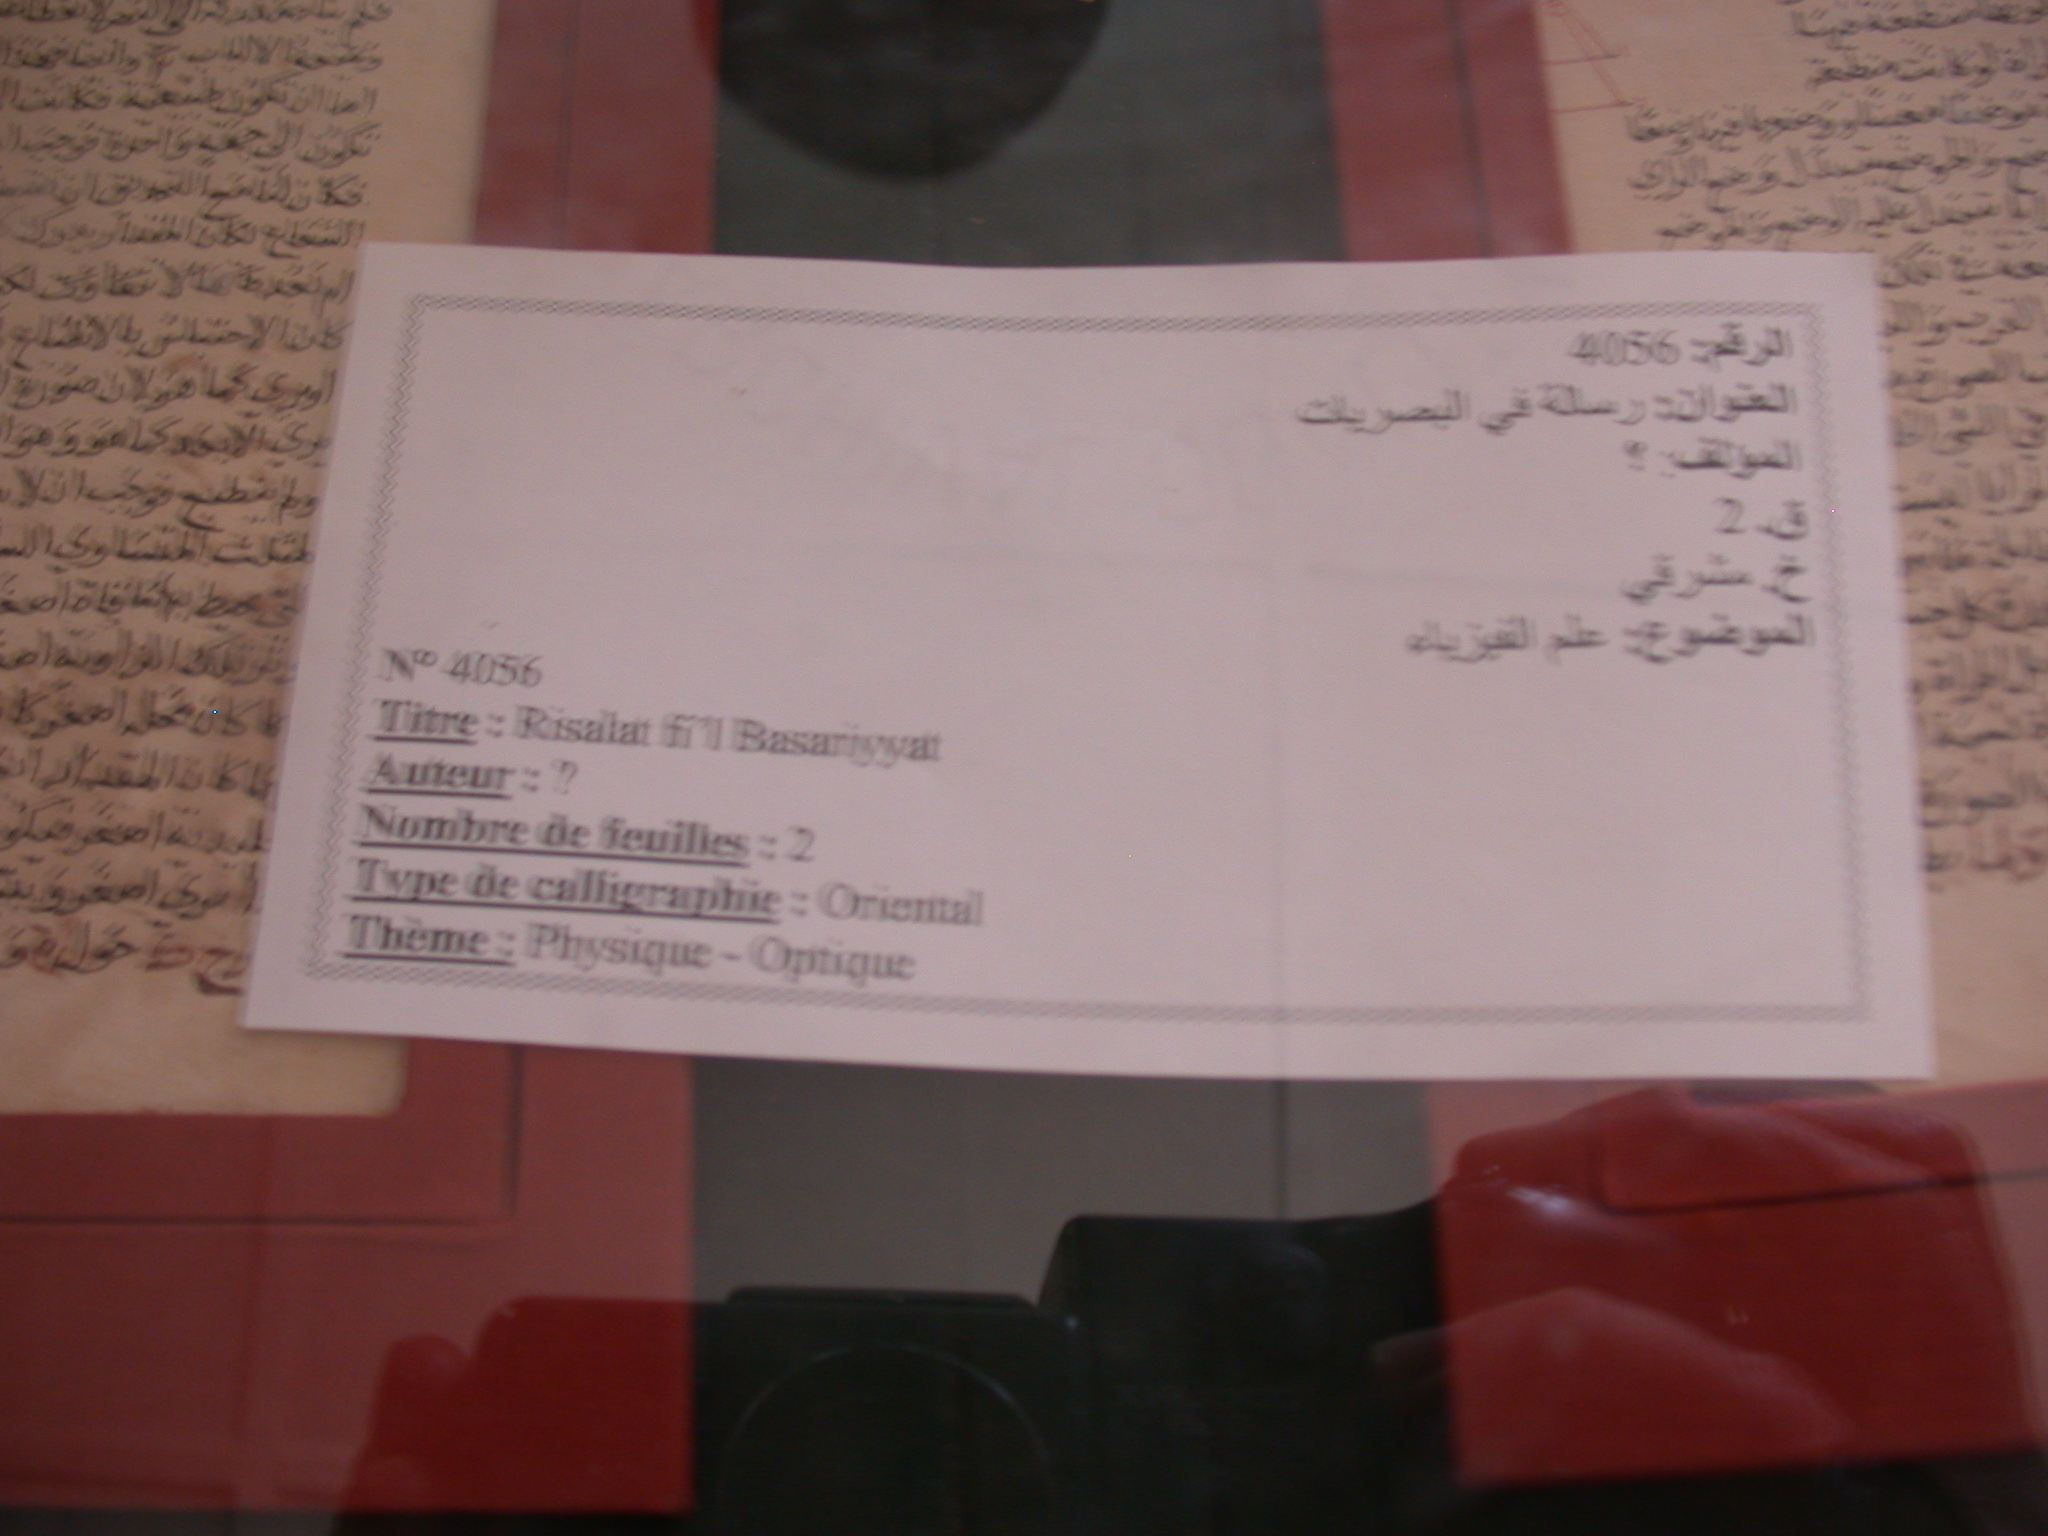 Manuscript, Risalat fil Basariyyat, Detail, Ahmed Baba Institute, Institut des Hautes Etudes et de Recherches Islamiques, Timbuktu, Mali